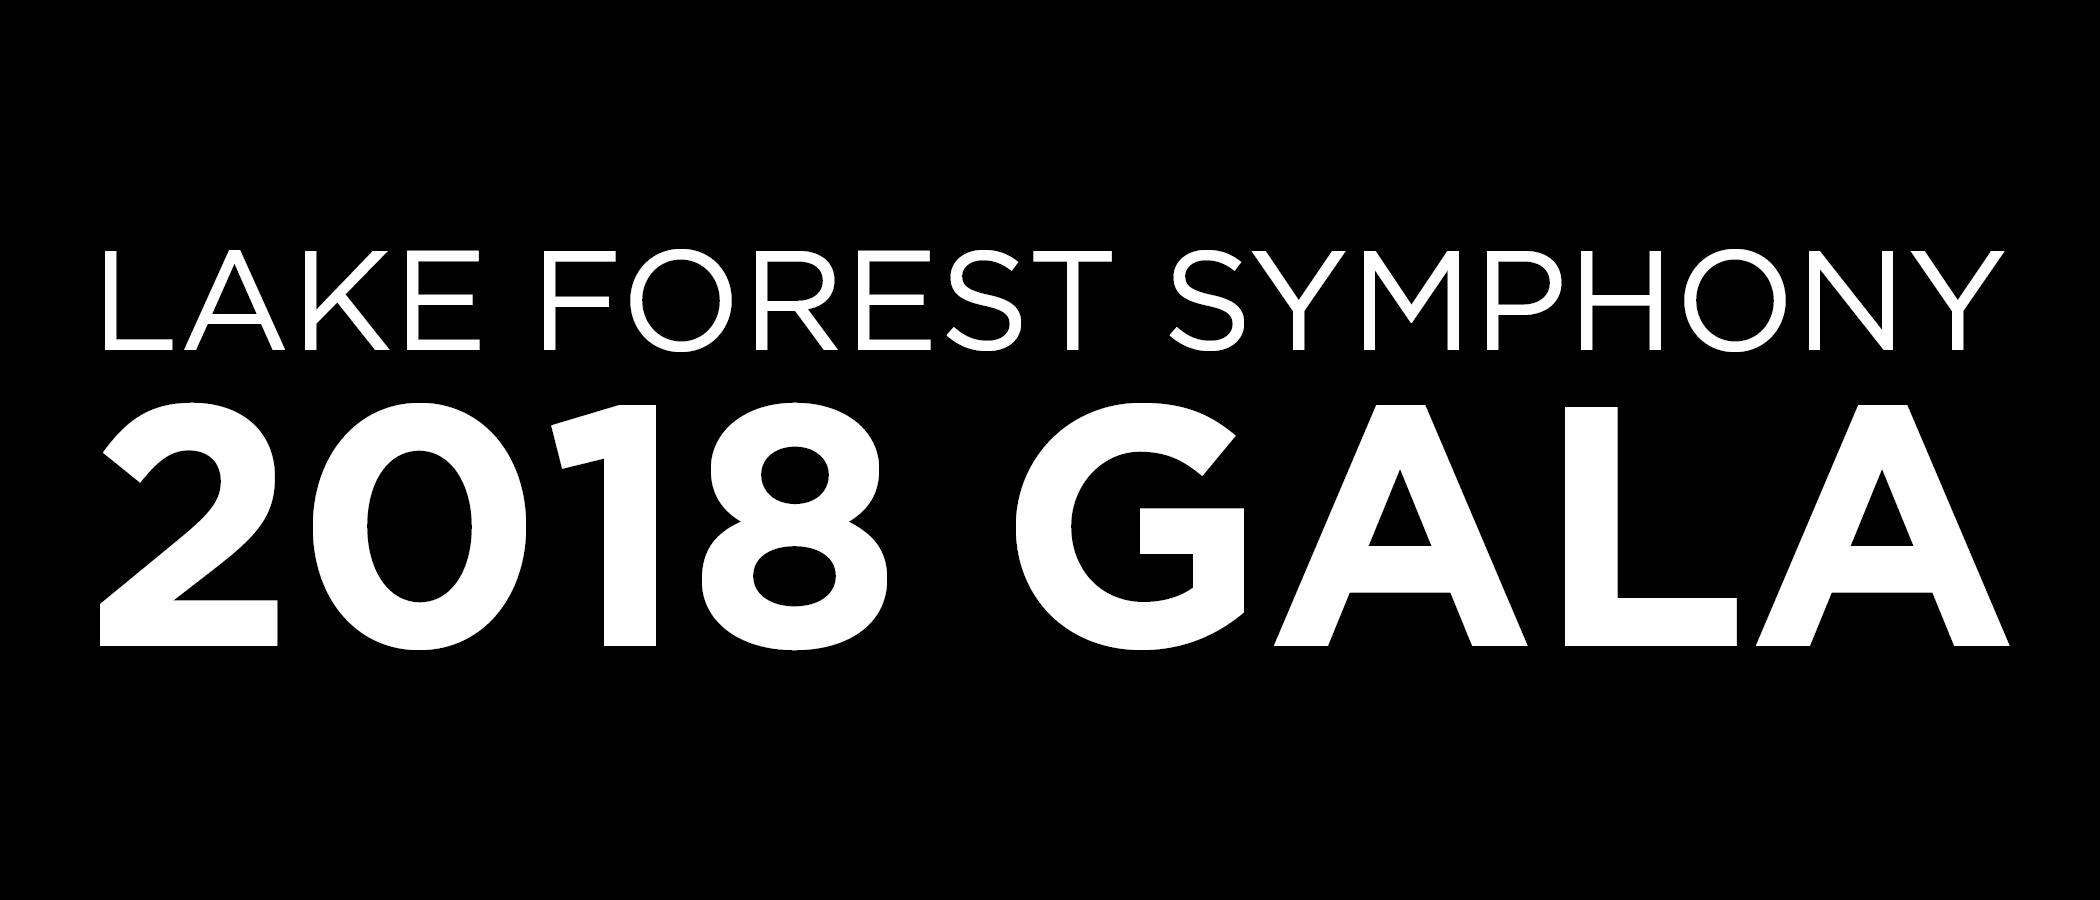 LFS 2018 Gala IMG.jpg